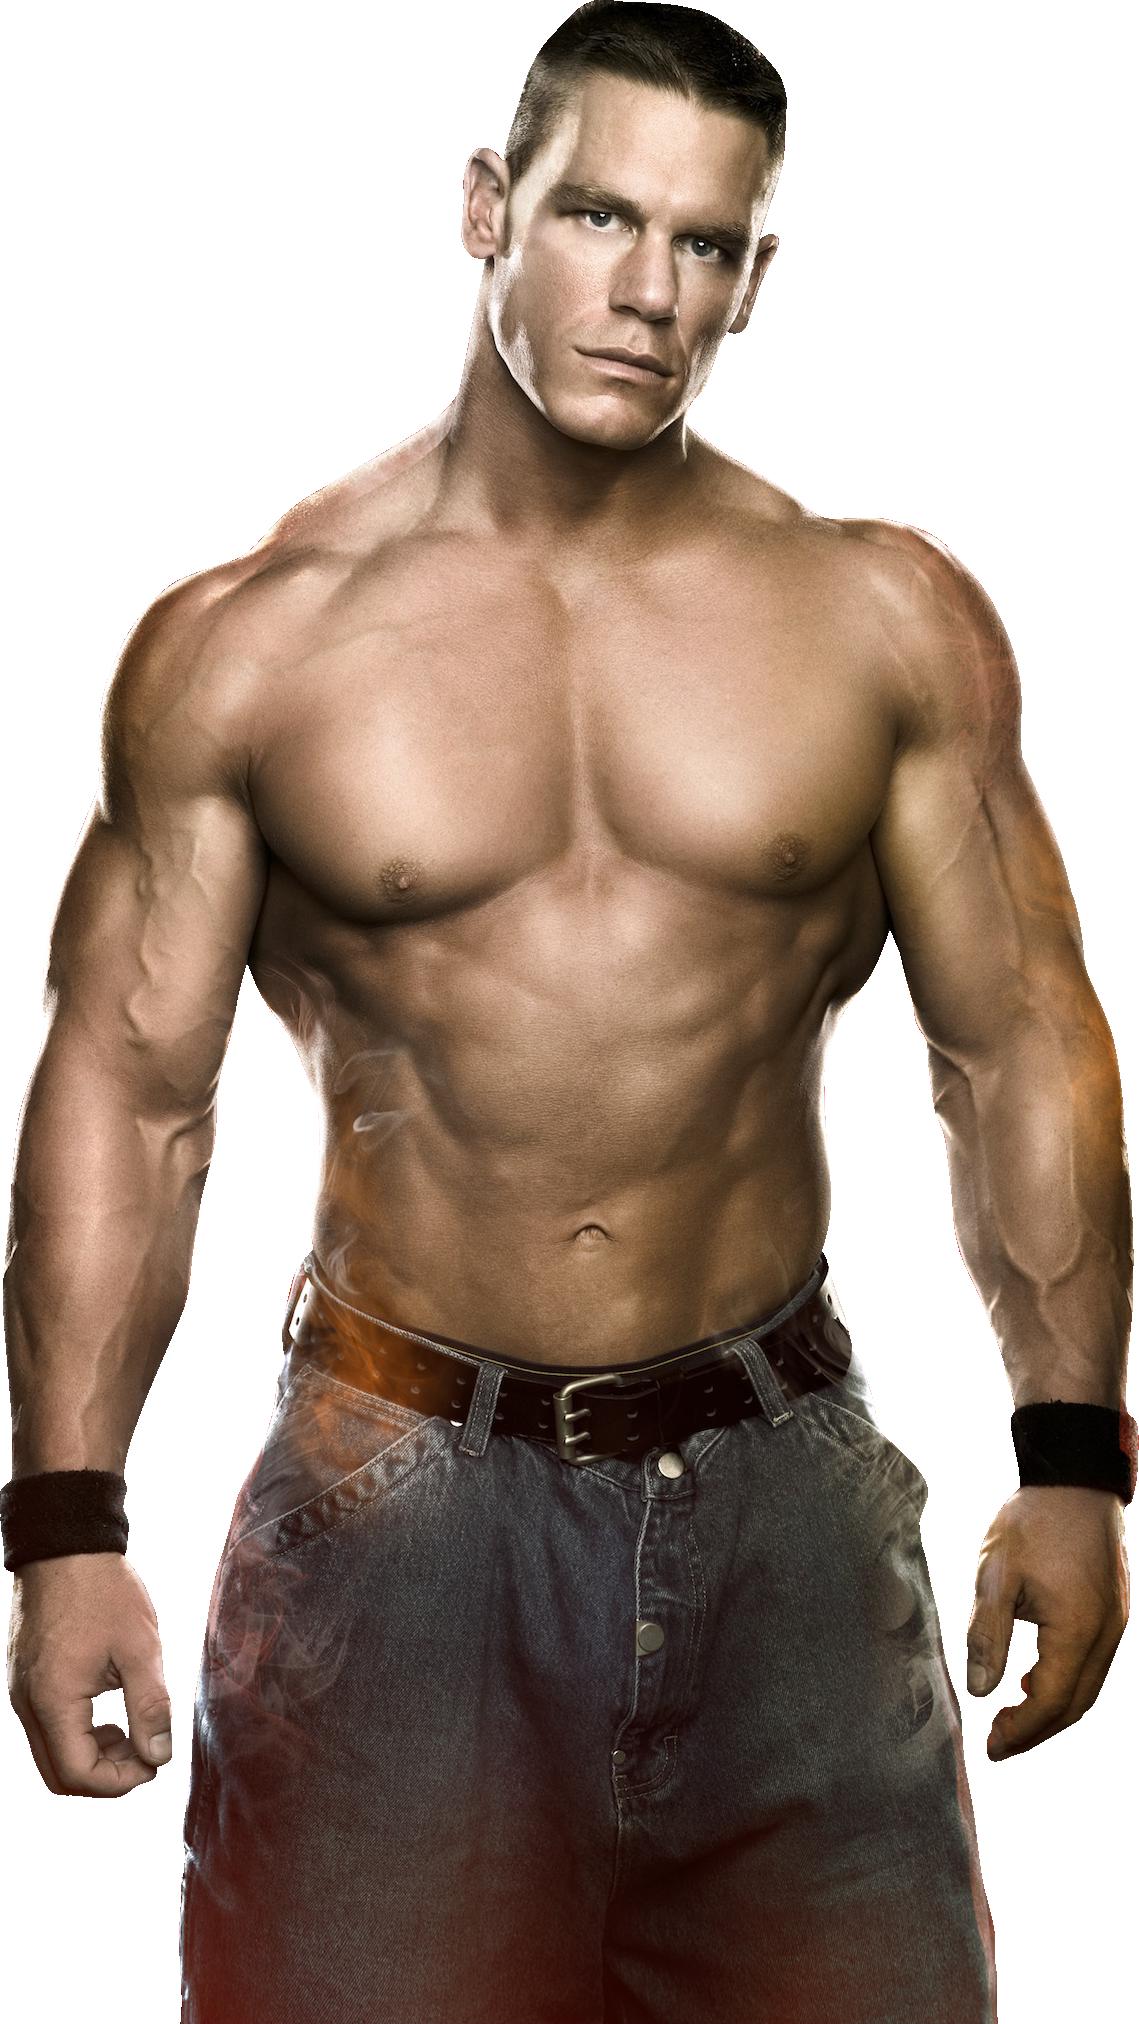 Wwe 2k14 John Cena Retro Render Cutout John Cena Wwe 2k14 Wwe